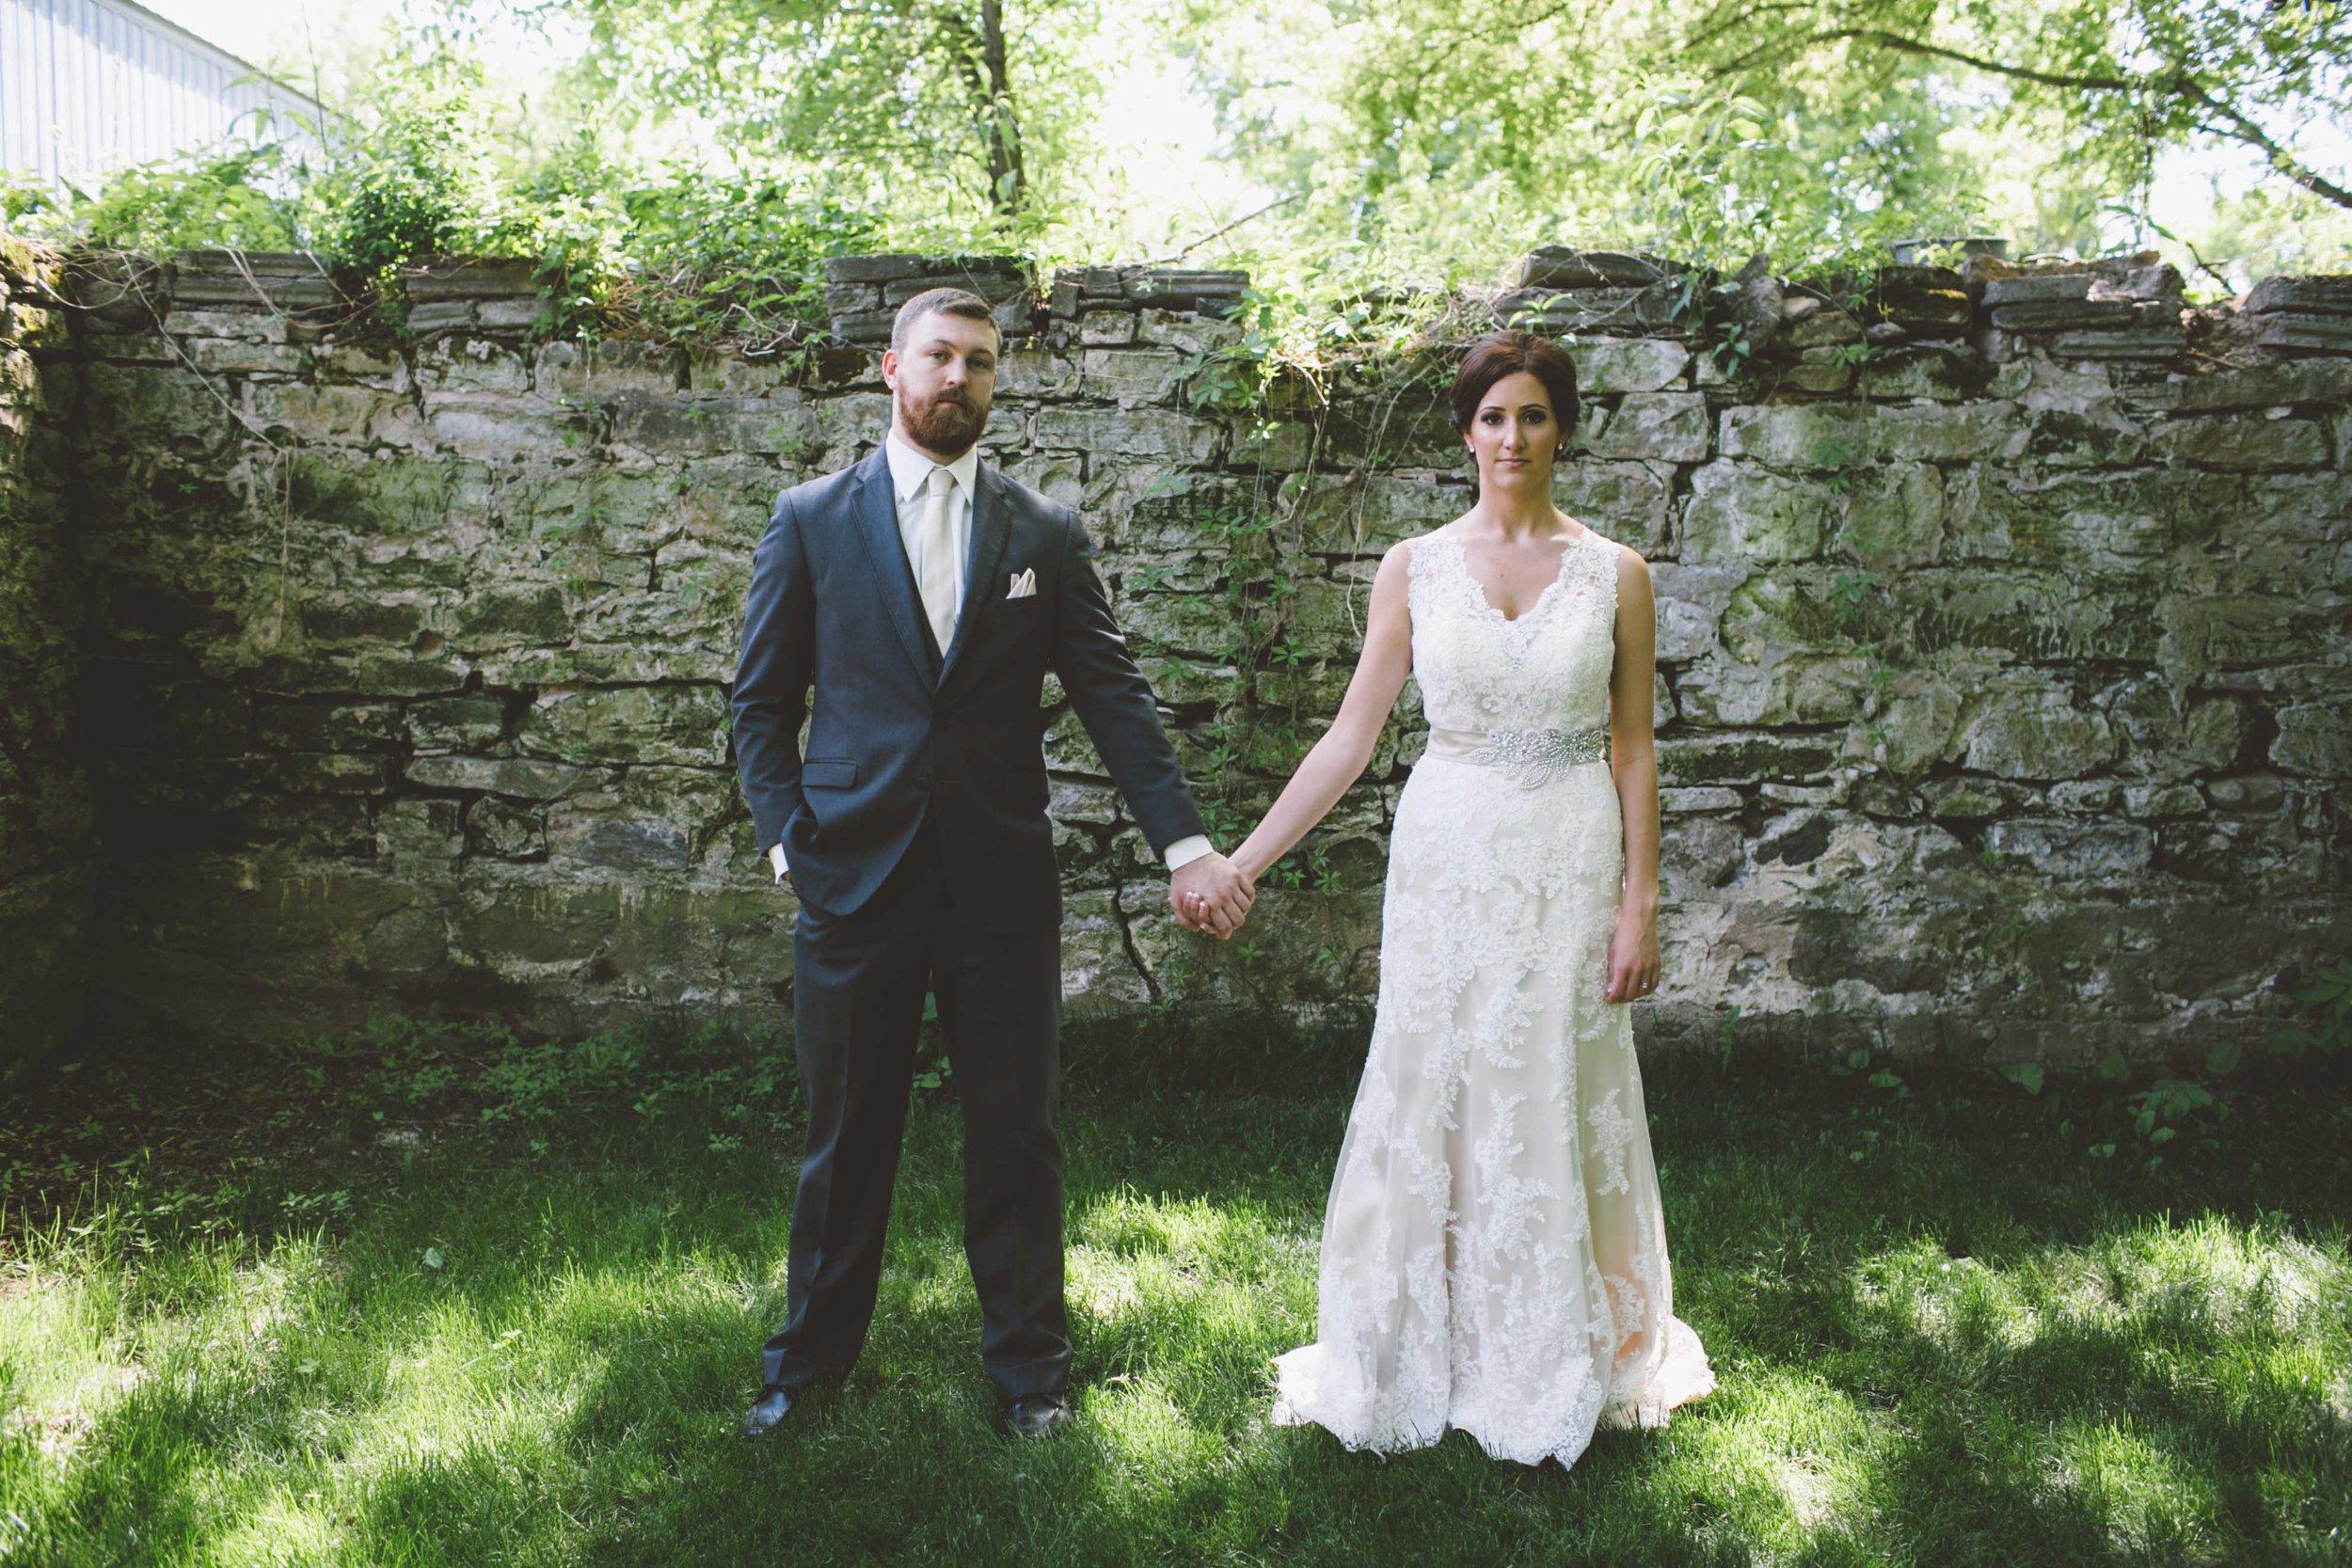 Mark Fierst Minneapolis Wedding Photographer | Sixpence Standard blog post | Bloom Lake Barn ruins backdrop